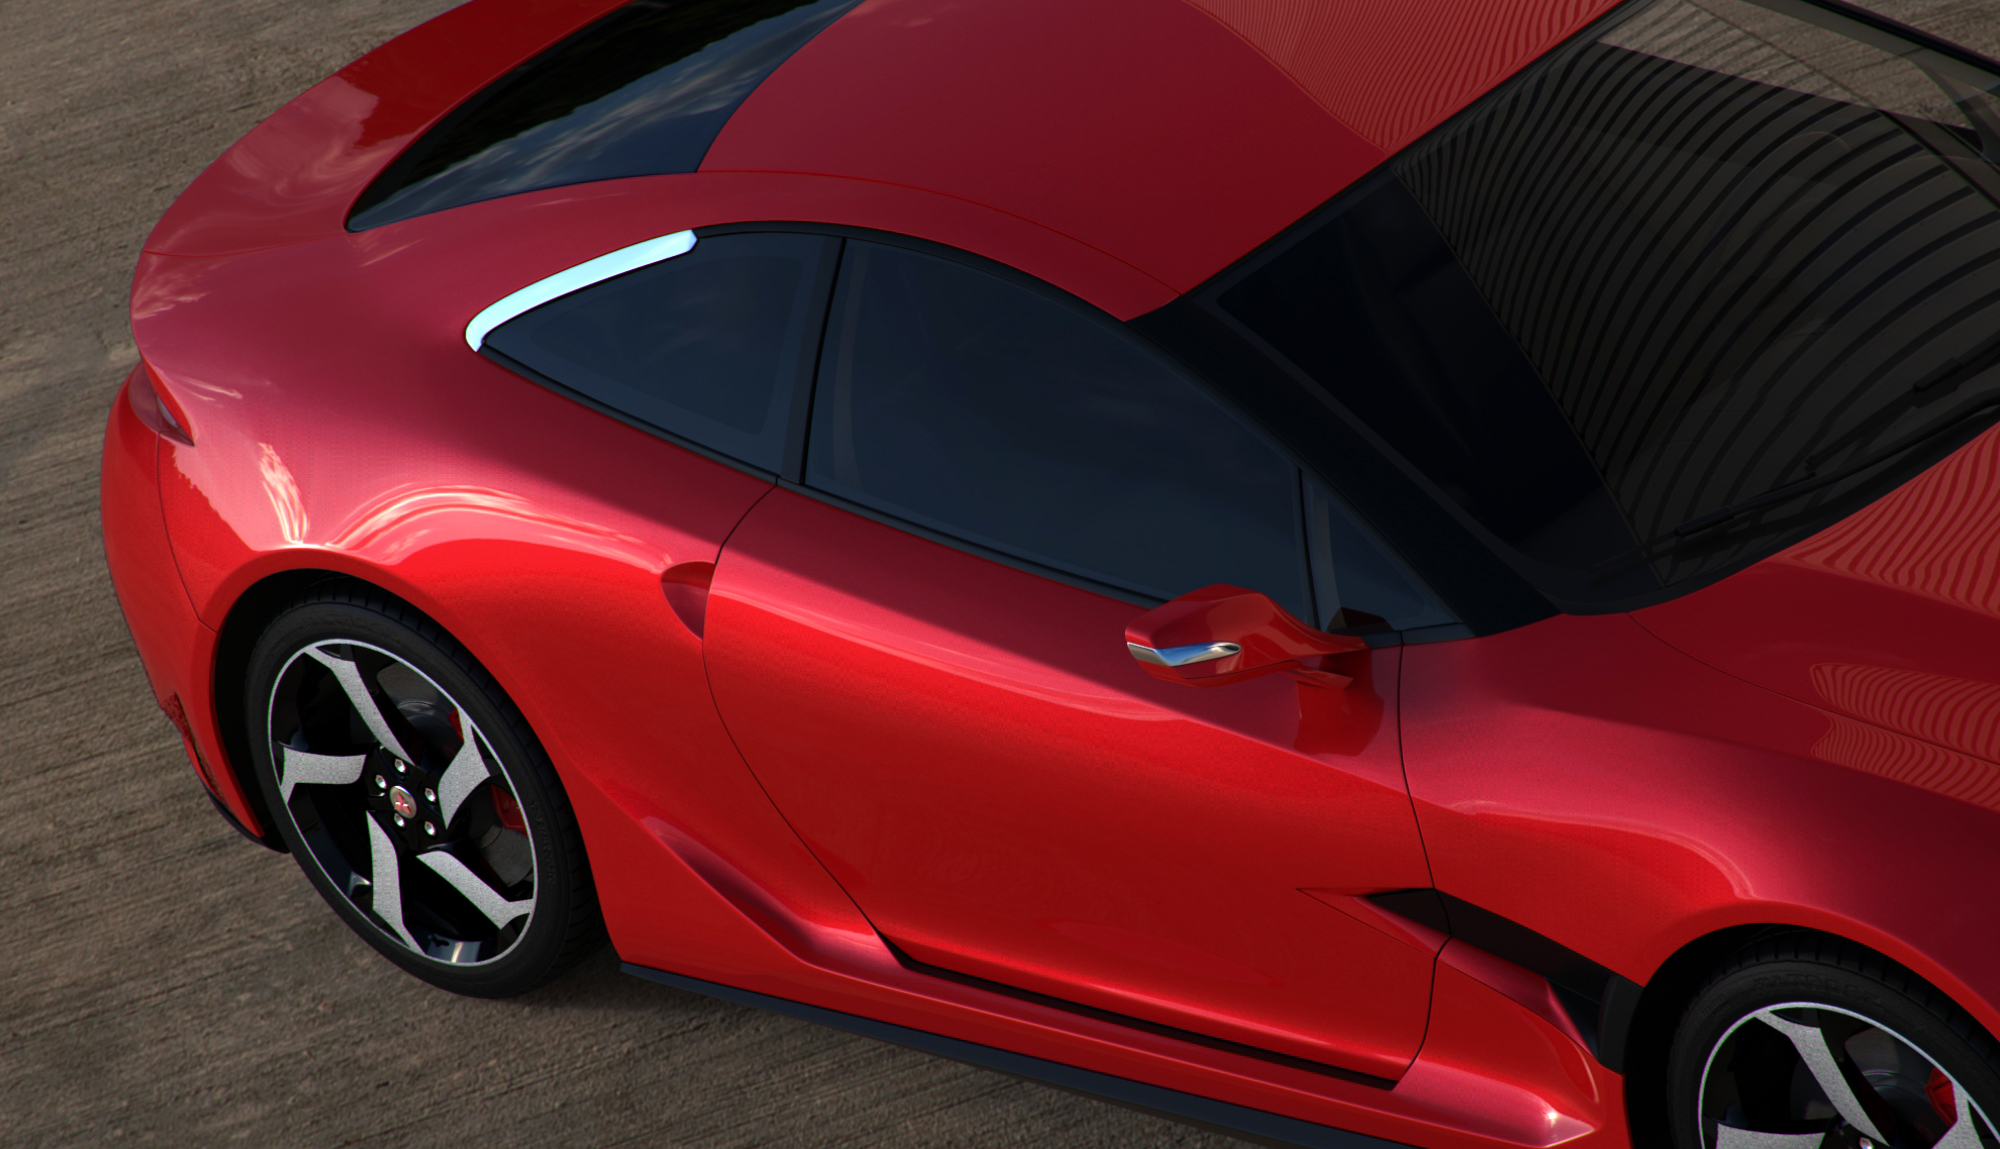 Mitsubishi Eclipse 2015 >> Eclipse 2015 Car Best Car Update 2019 2020 By Thestellarcafe